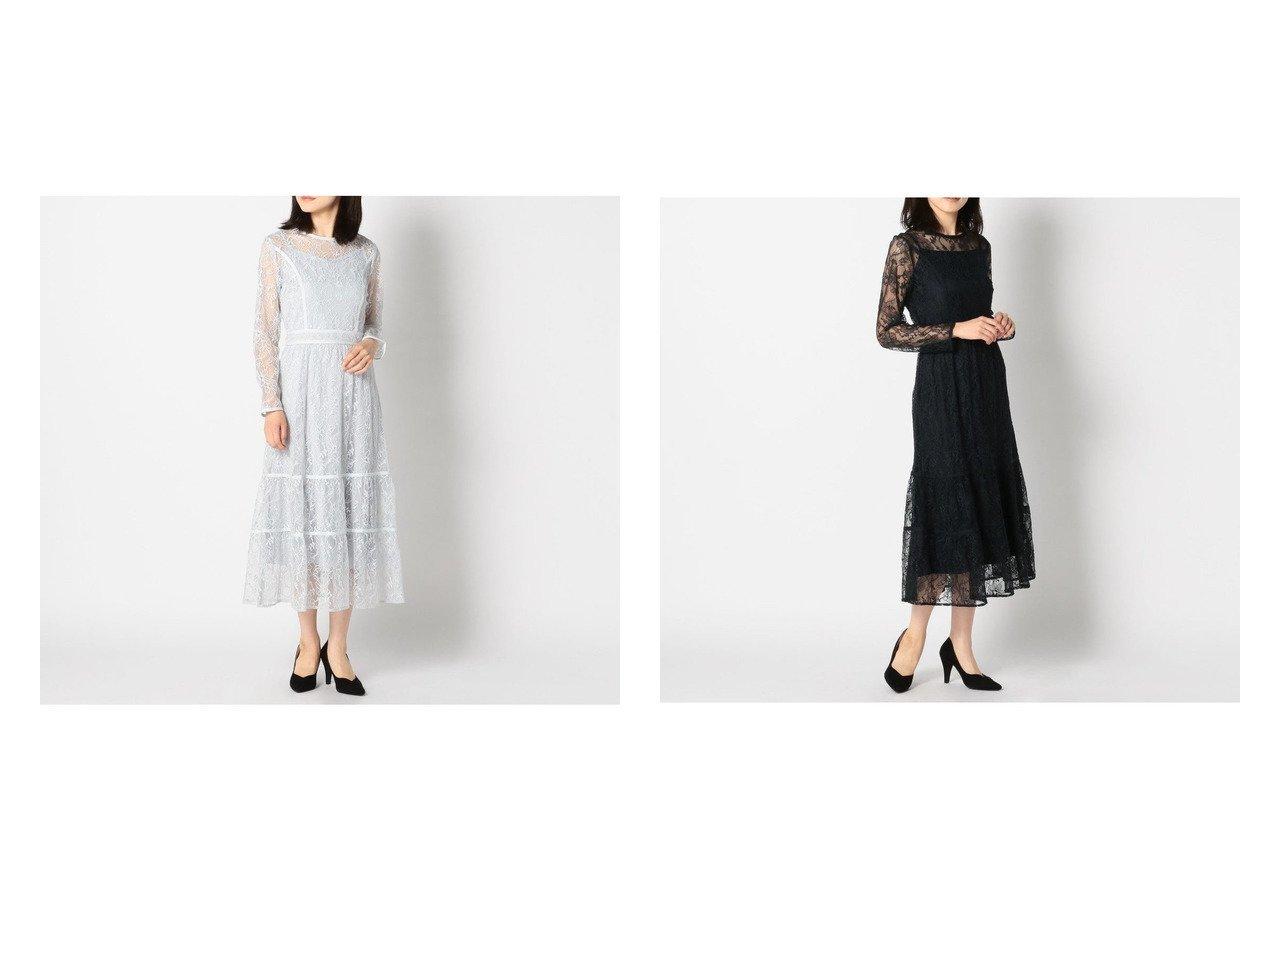 【MISCH MASCH/ミッシュマッシュ】のレースティーアードワンピース ワンピース・ドレスのおすすめ!人気、トレンド・レディースファッションの通販 おすすめで人気の流行・トレンド、ファッションの通販商品 メンズファッション・キッズファッション・インテリア・家具・レディースファッション・服の通販 founy(ファニー) https://founy.com/ ファッション Fashion レディースファッション WOMEN ワンピース Dress 2021年 2021 2021 春夏 S/S SS Spring/Summer 2021 S/S 春夏 SS Spring/Summer おすすめ Recommend インナー エレガント ティアード パーティ レース 春 Spring  ID:crp329100000024864